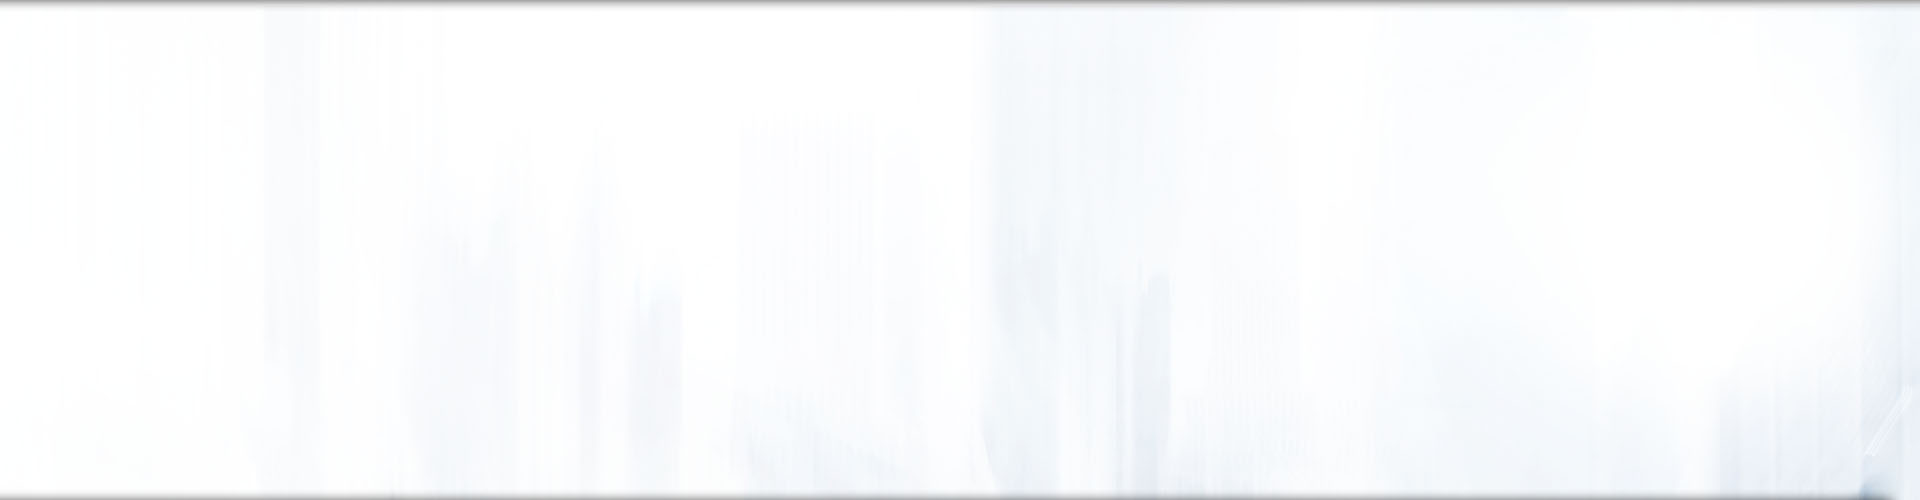 1920x500-animation-bg3